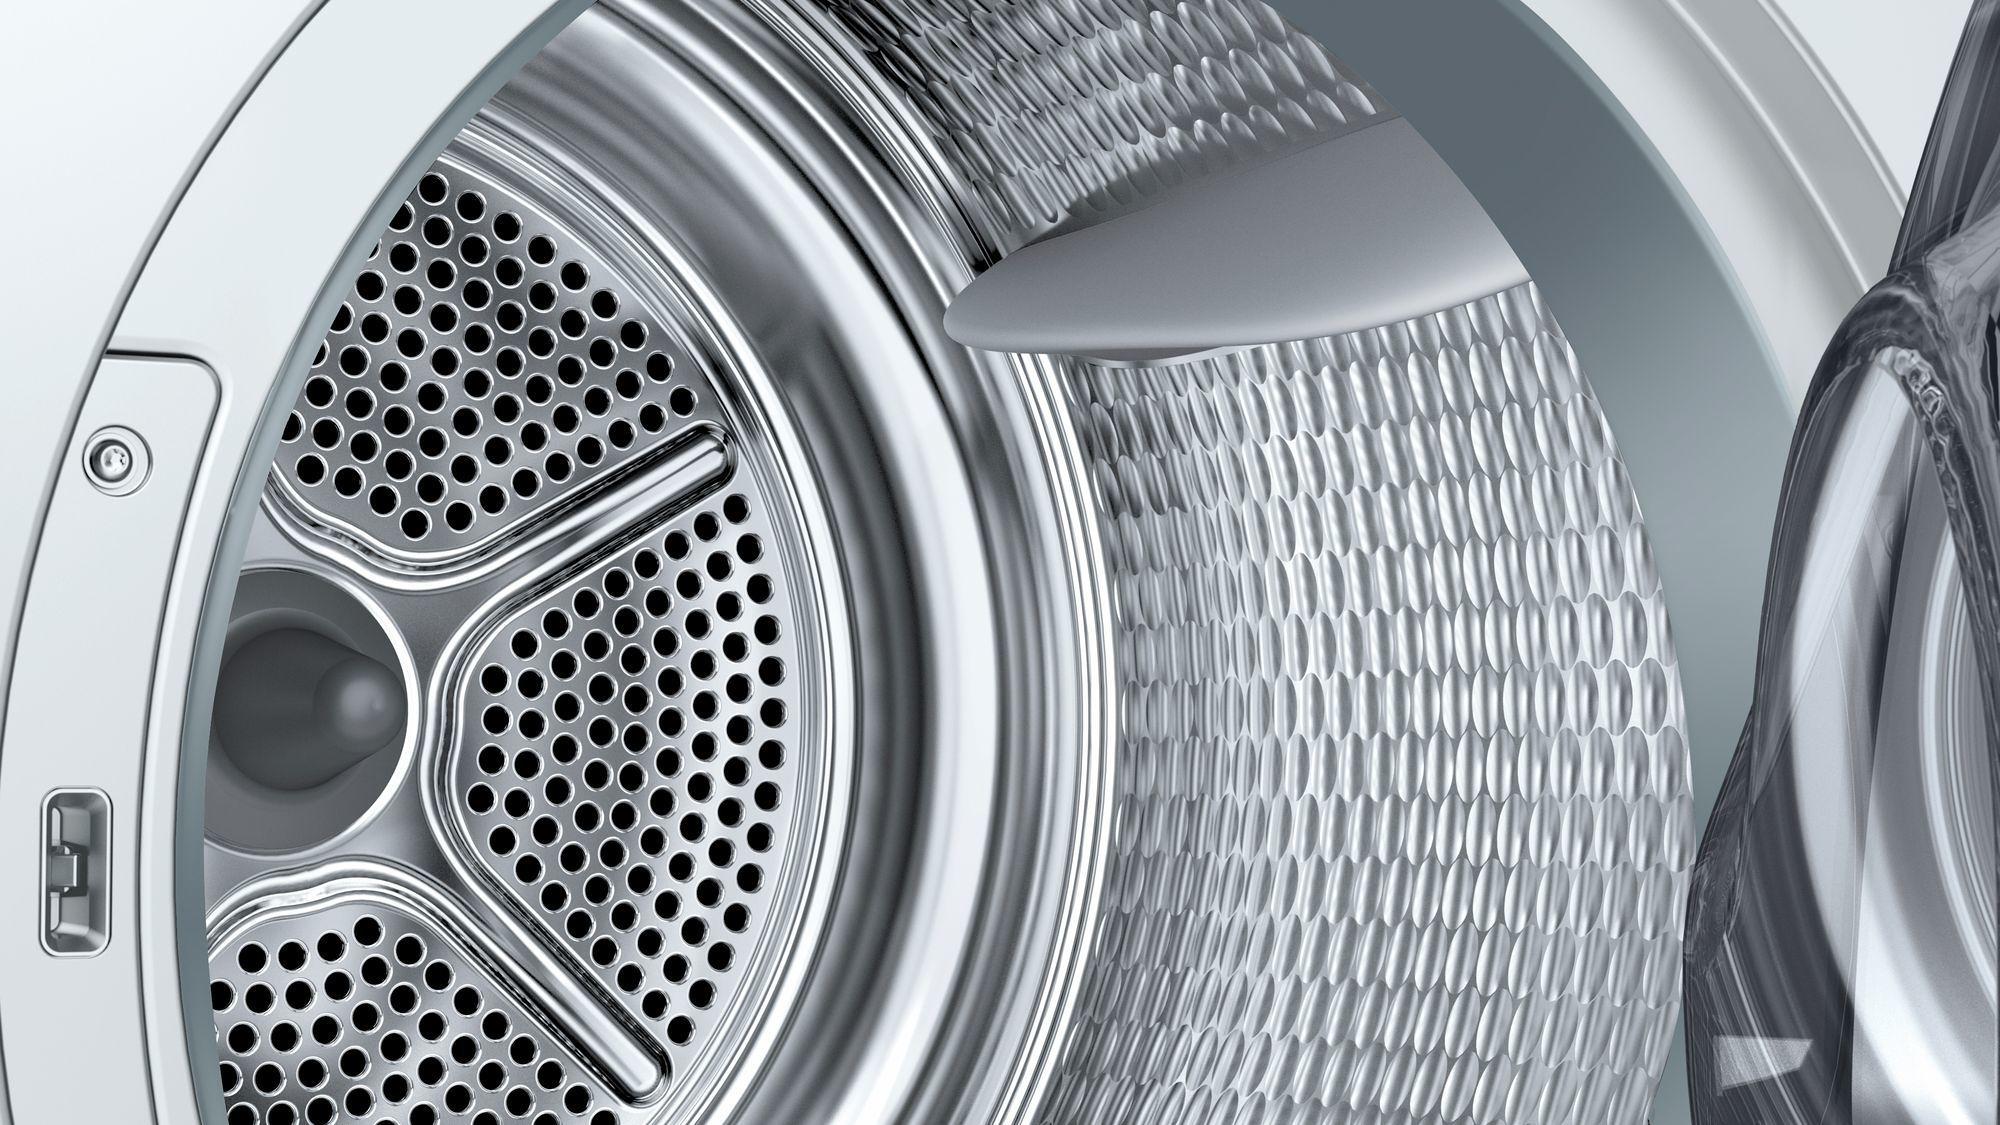 Bosch wtw874h3 7 kg a wärmepumpentrockner selfcleaning